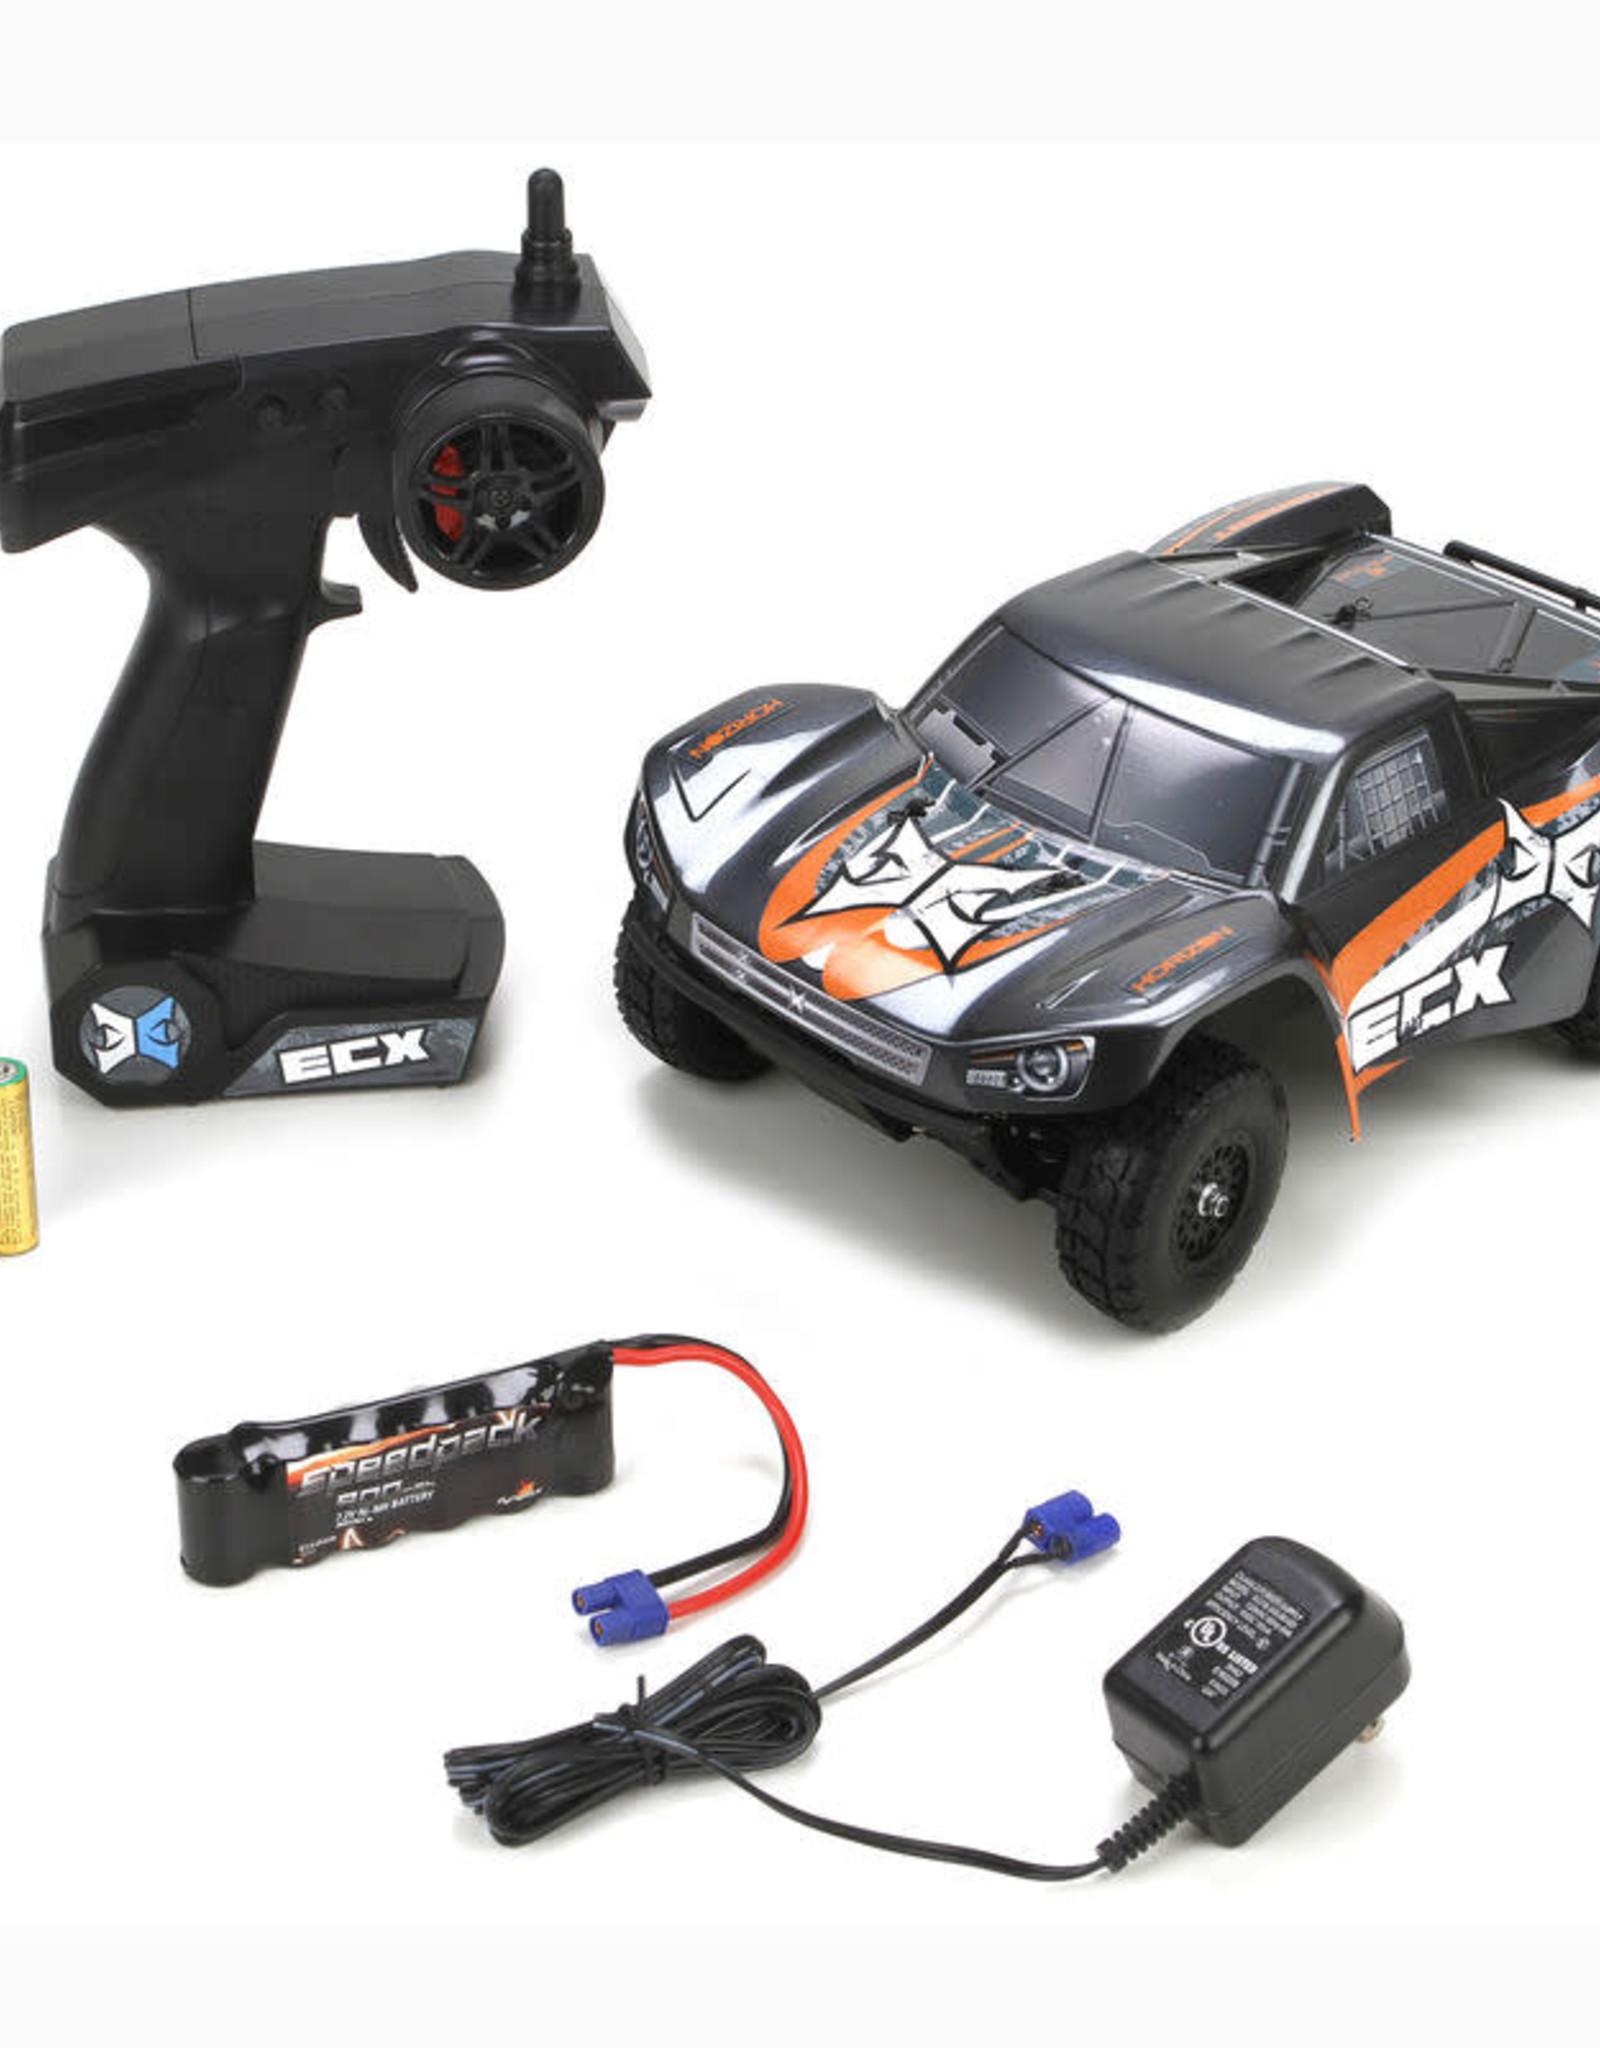 ECX ECX01001T1 Torment1/18 4WD Short Course Truck:Gray/OrangeRTR